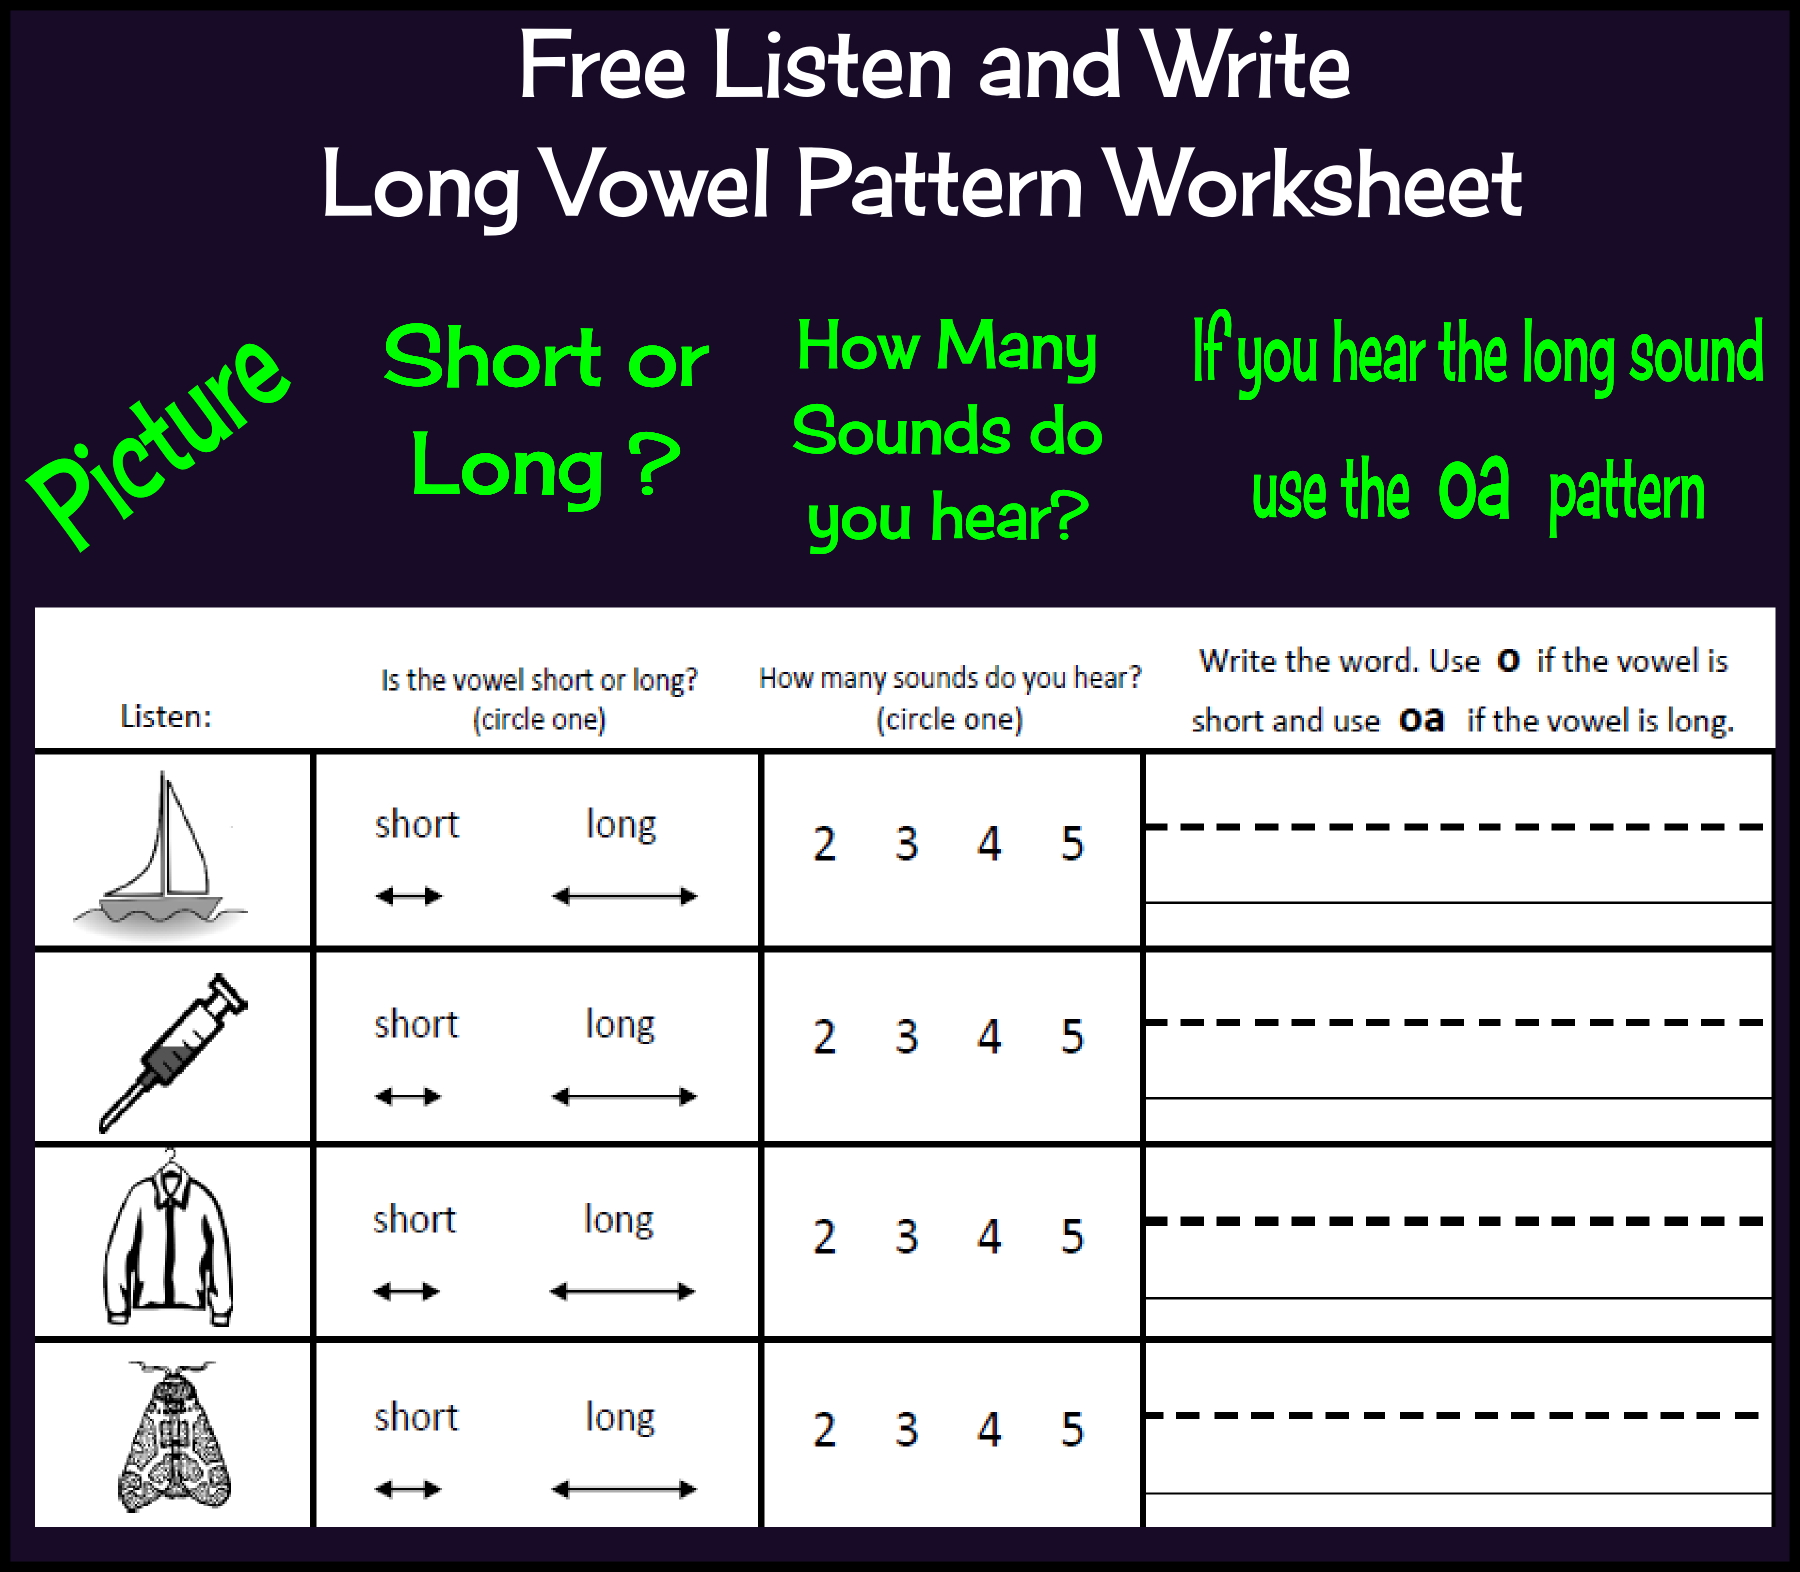 Free Listen And Write Long Vowel Patterns Long O Worksheet